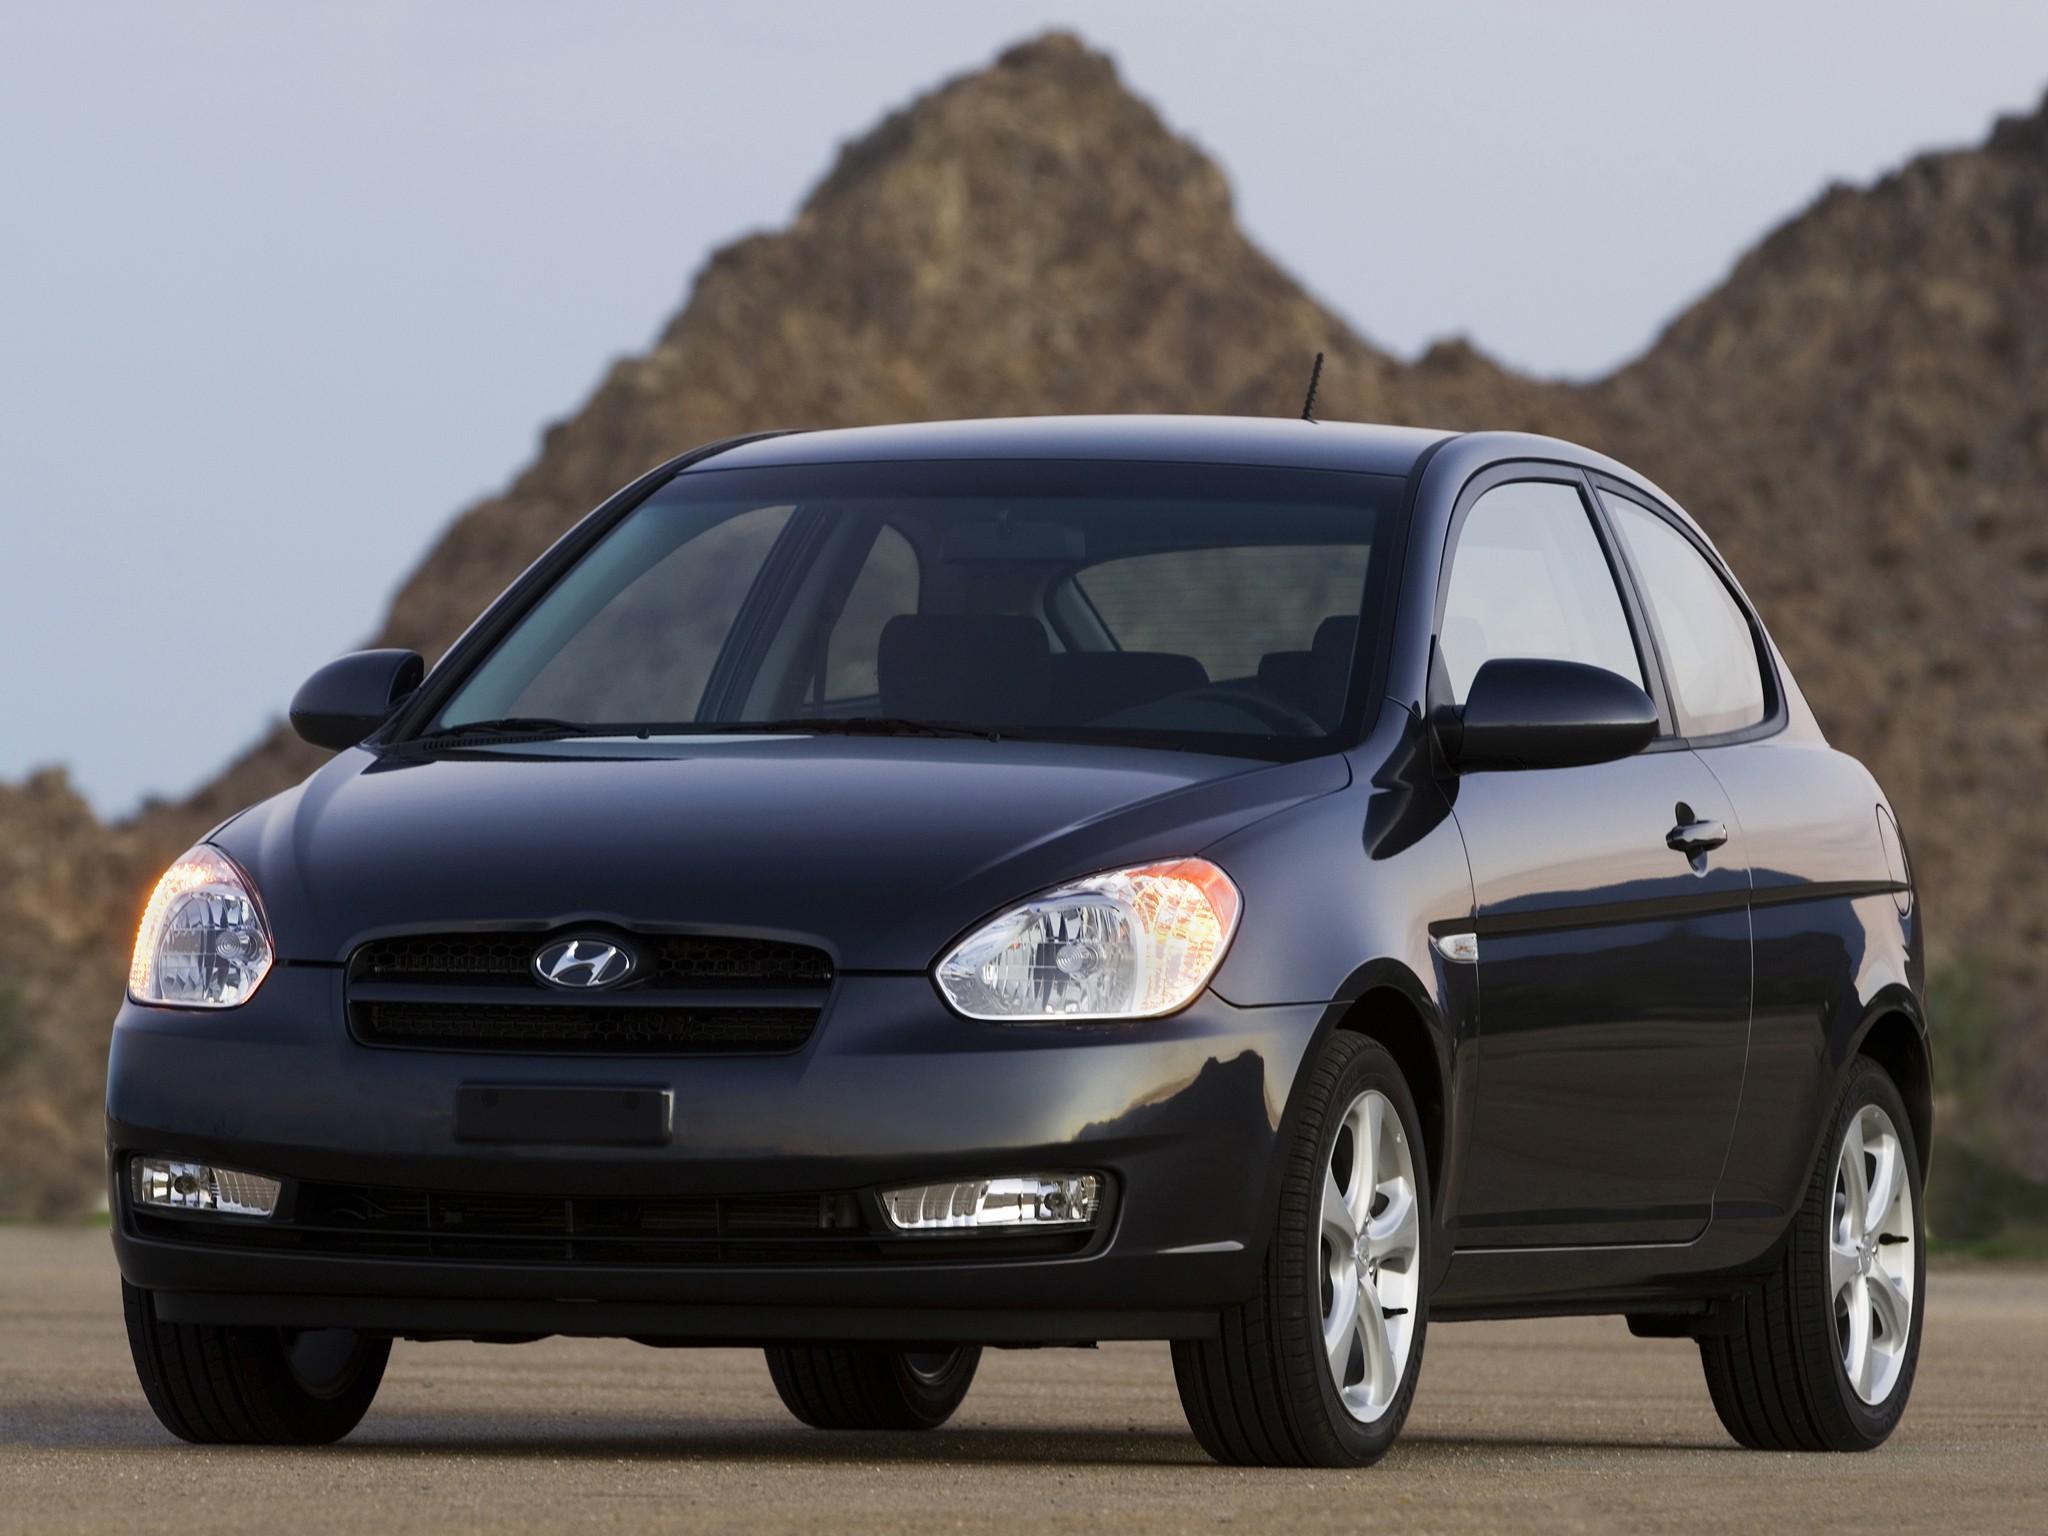 Hyundai Accent 3 Doors 2006 2007 2008 2009 2010